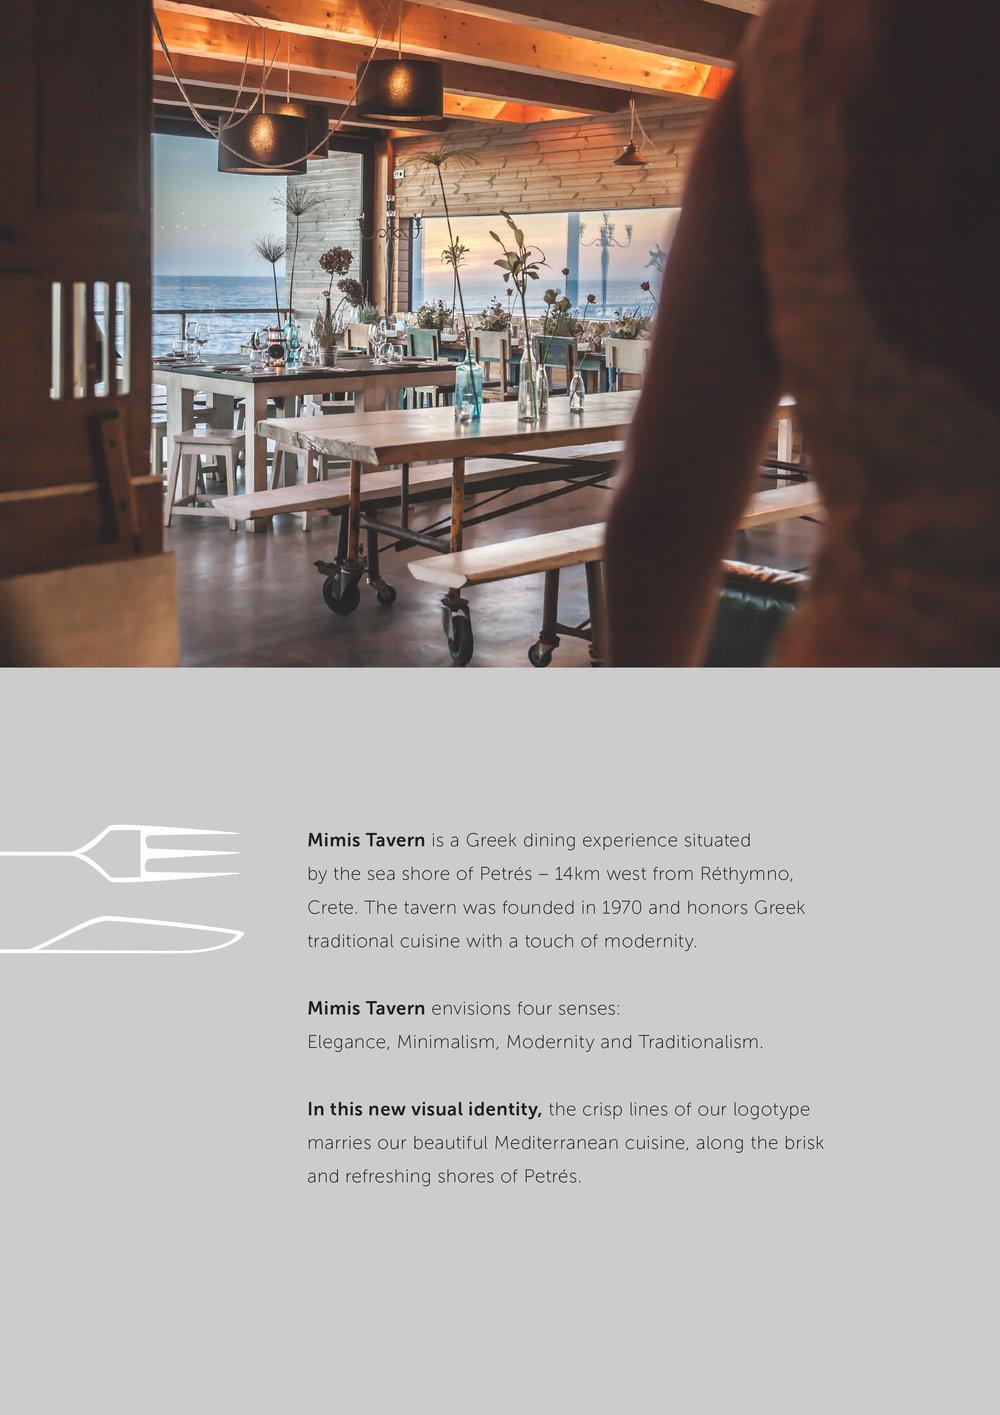 Mimis-tavern-concept.jpg